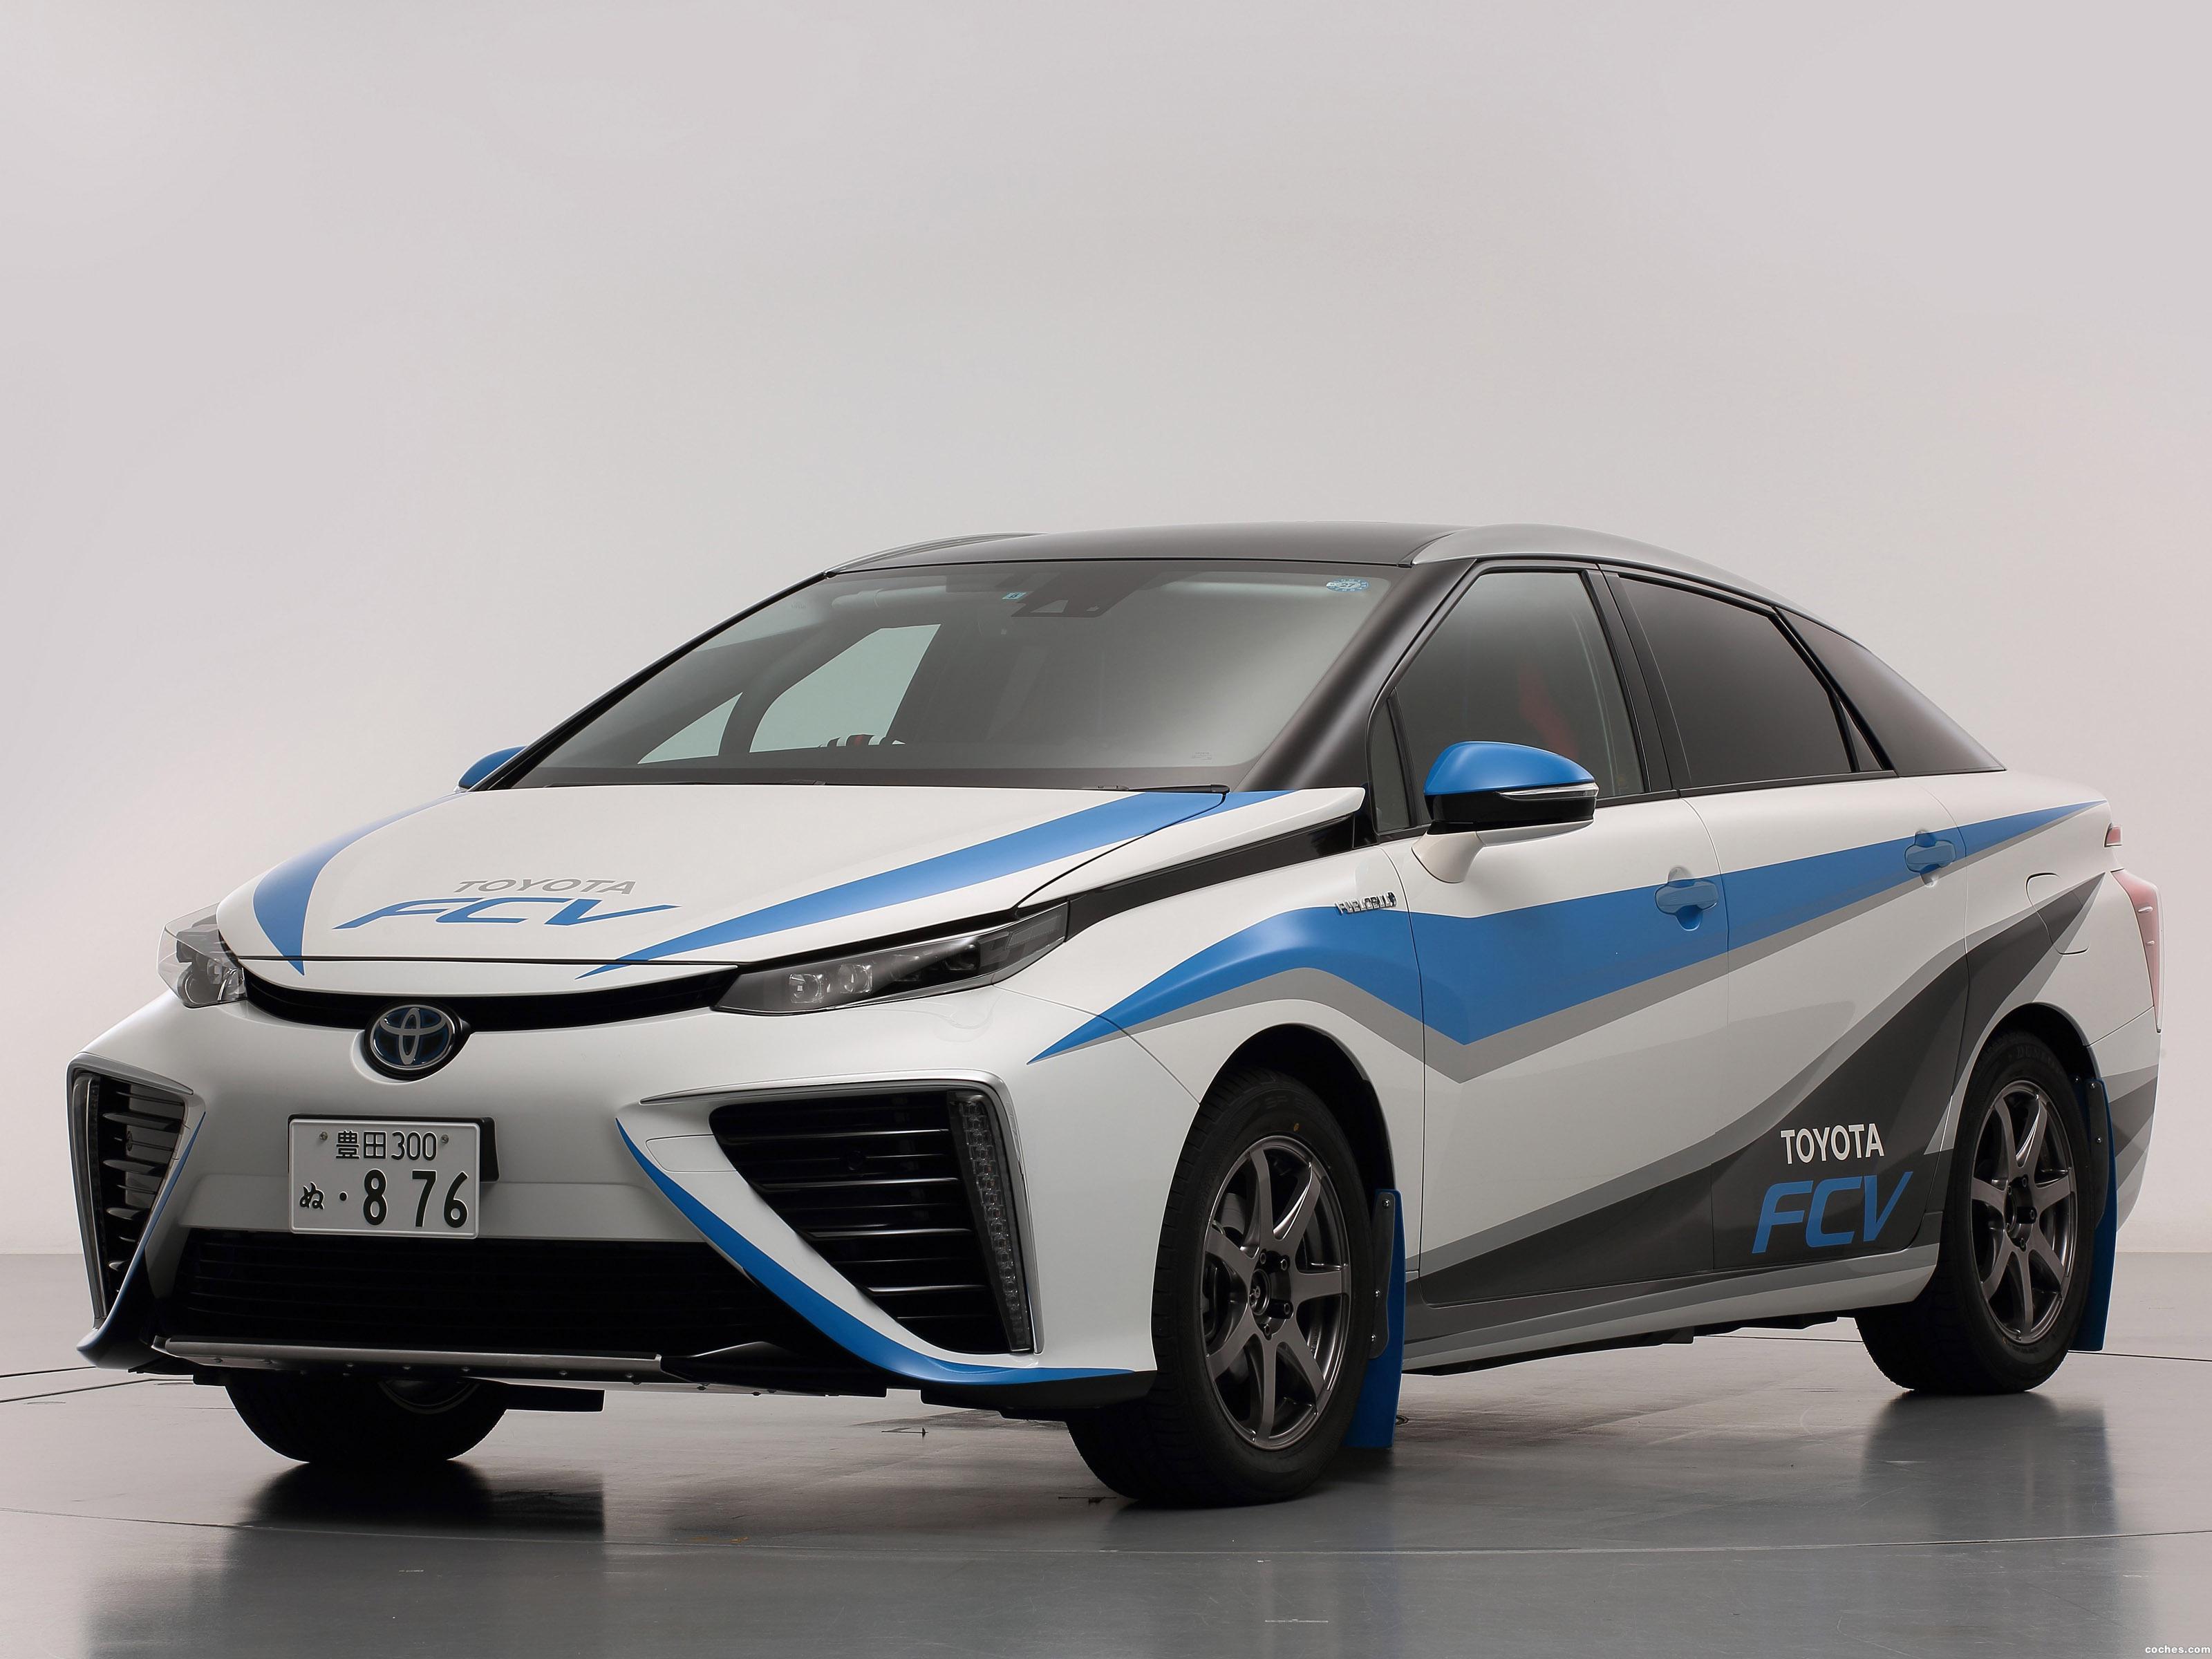 toyota_fcv-rally-zero-car-2014_r5